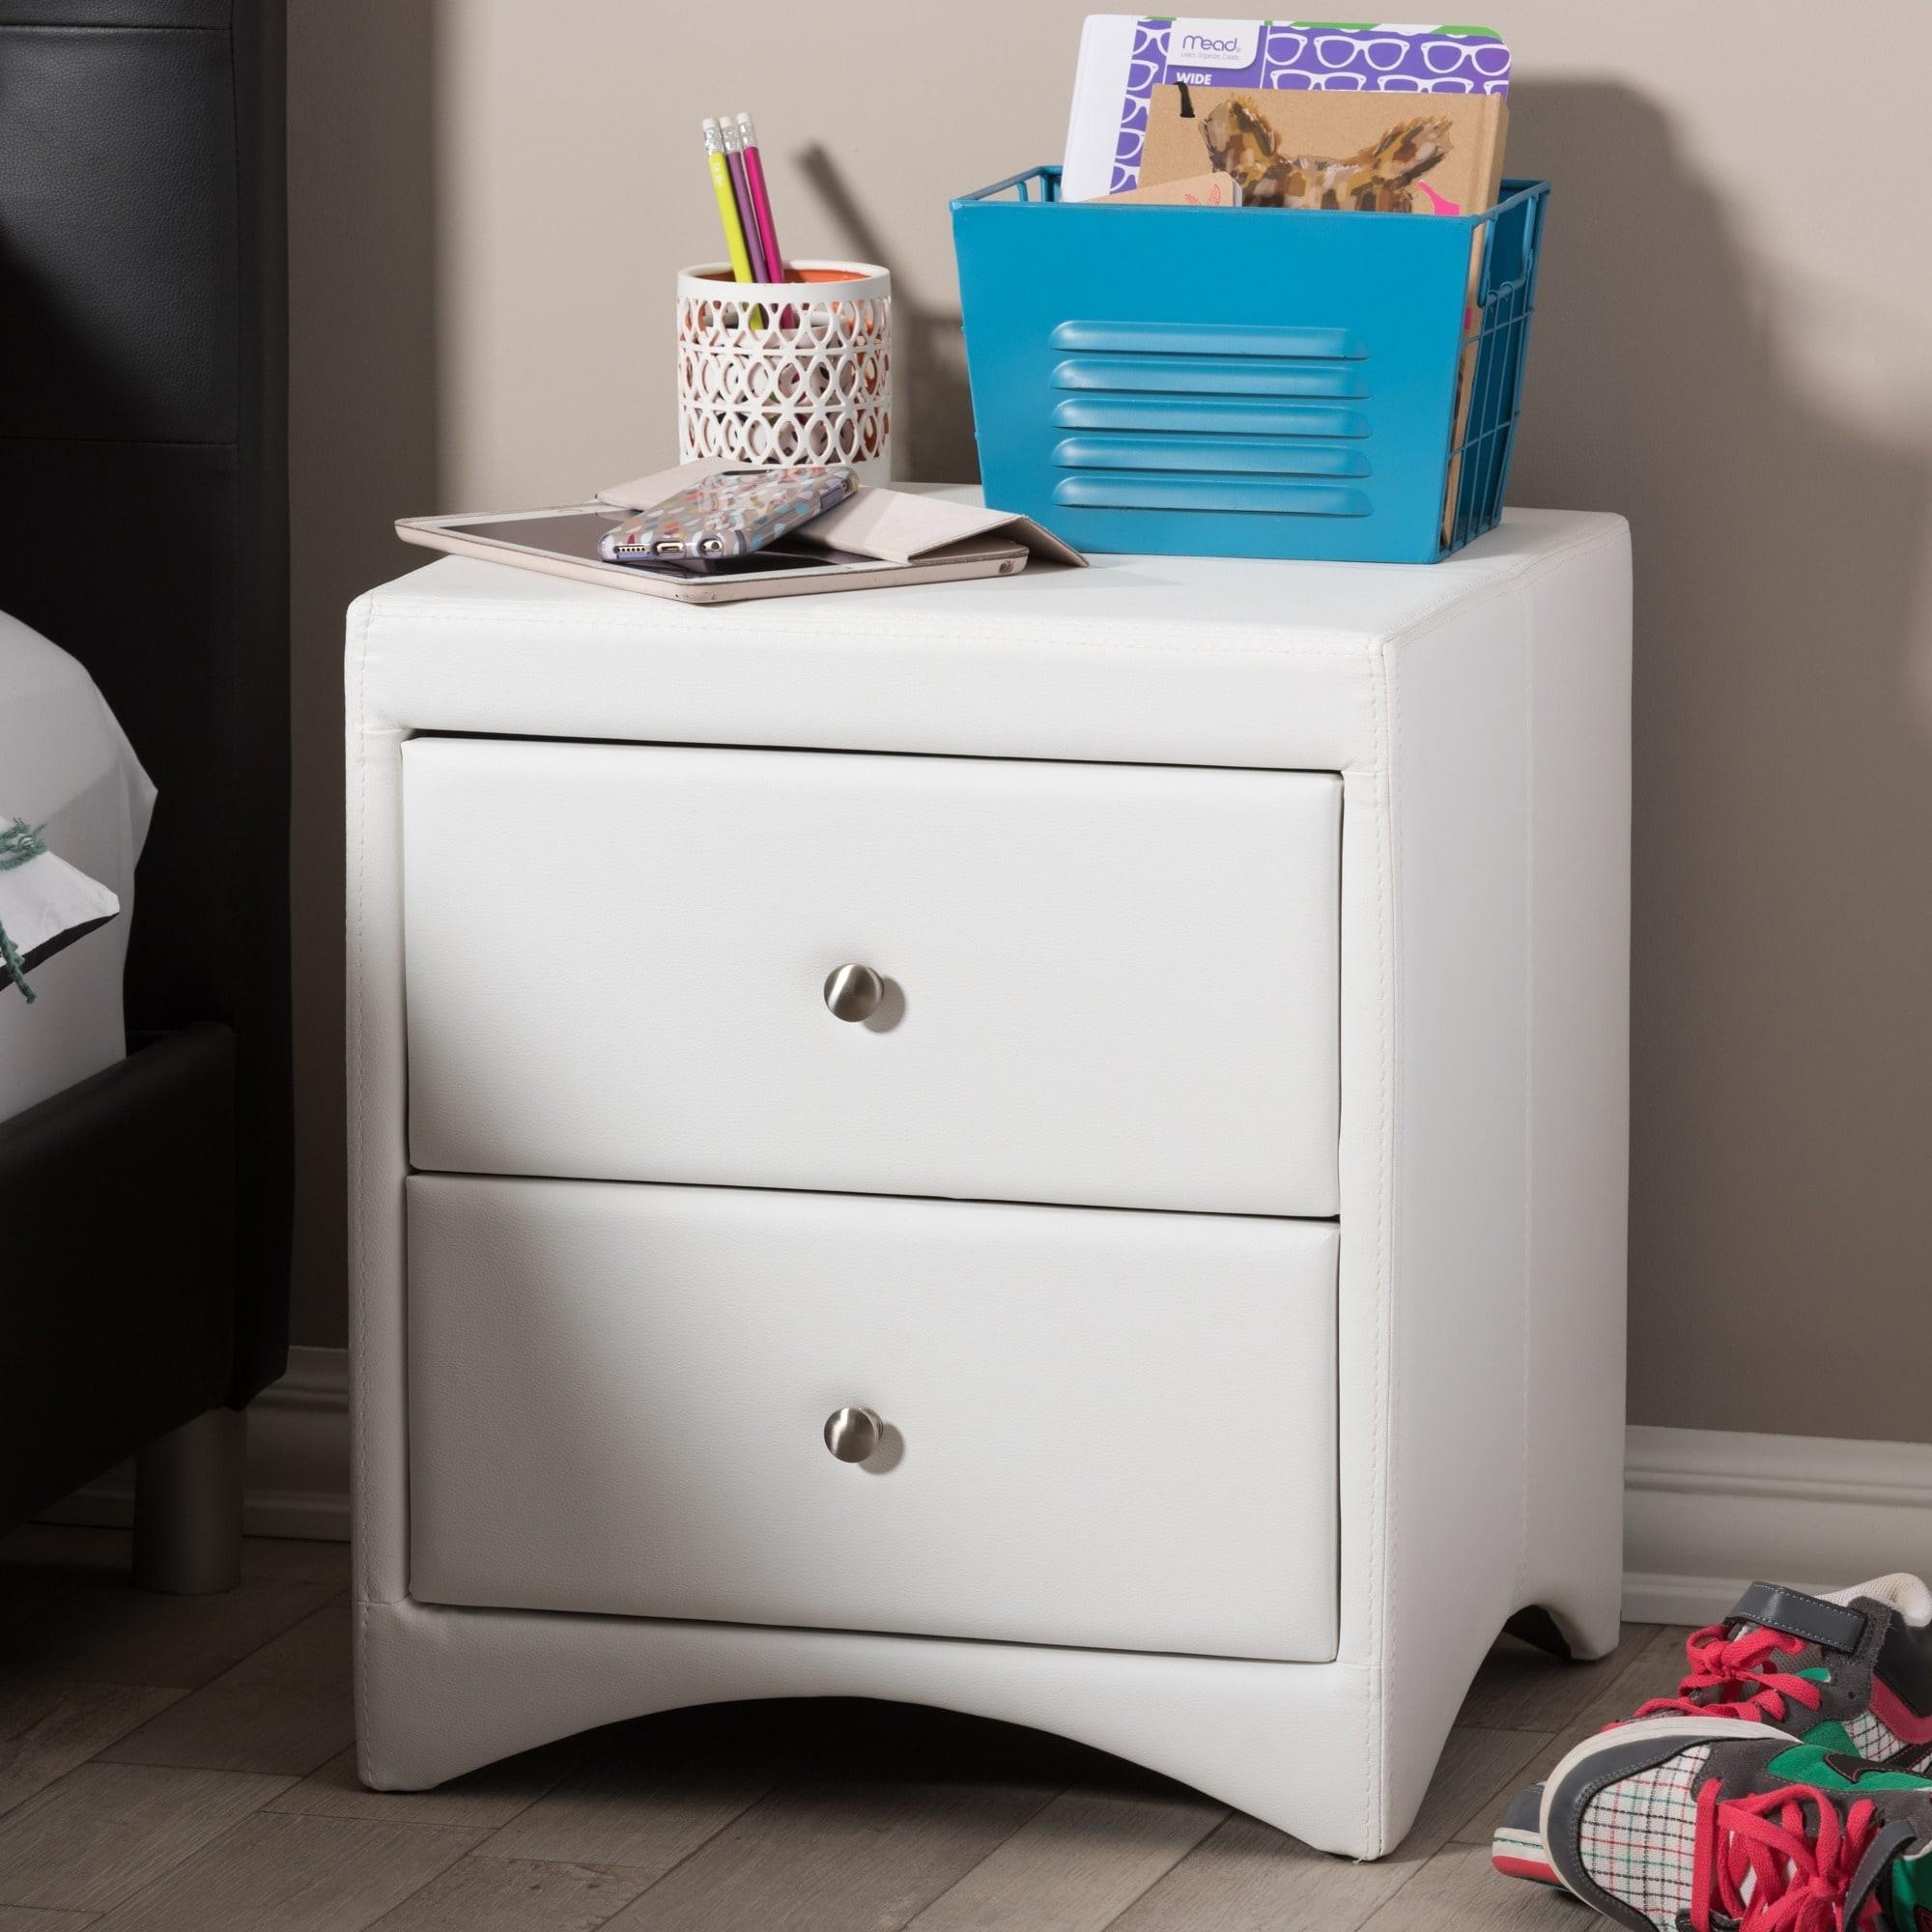 Modern bedroom nightstand upholstered white faux leather bedside modern bedroom nightstand upholstered white faux leather bedside table storage watchthetrailerfo